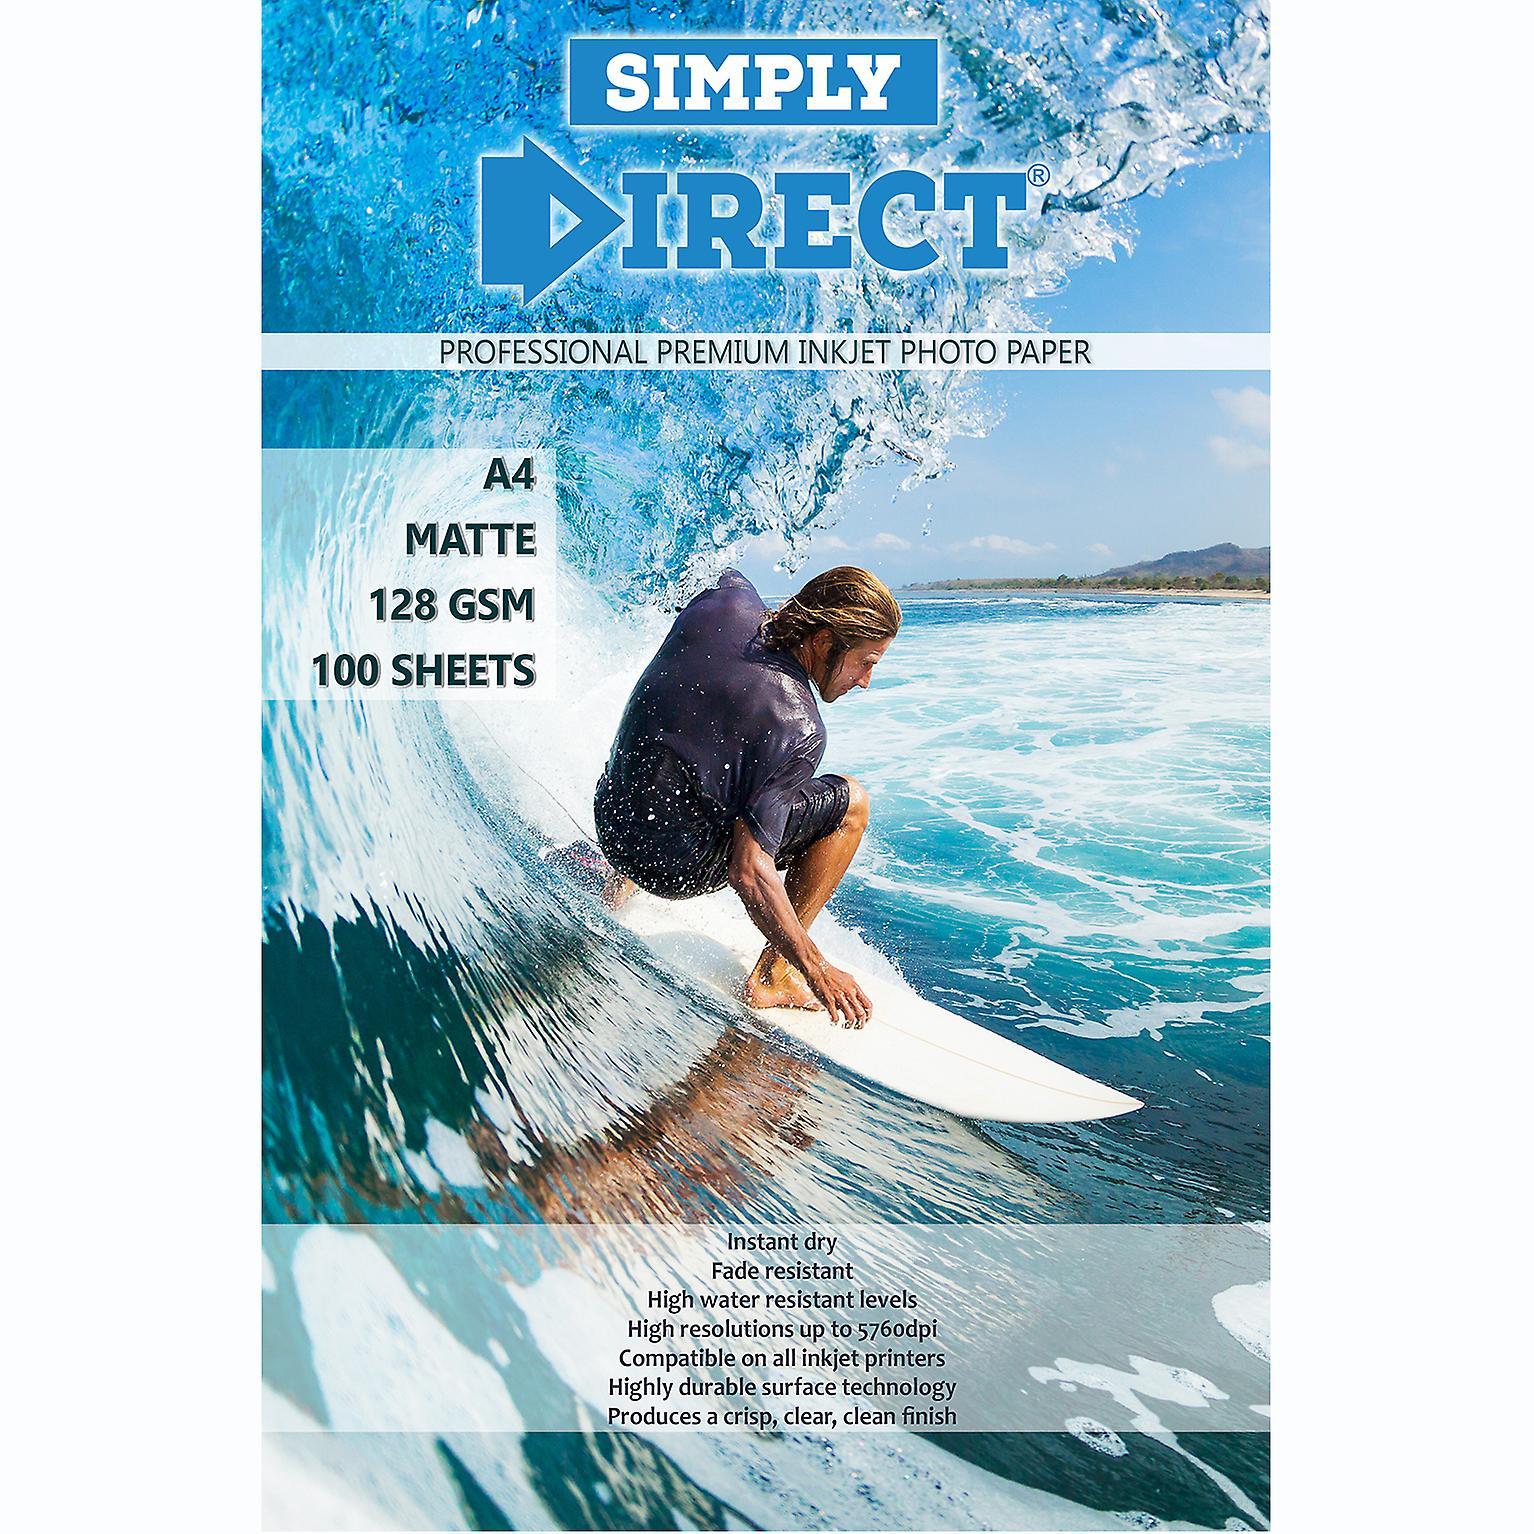 100 x Simply Direct A4 Matte Inkjet Photo FSC Printing Paper - 128gsm - Professional Premium Photographic Printer Paper